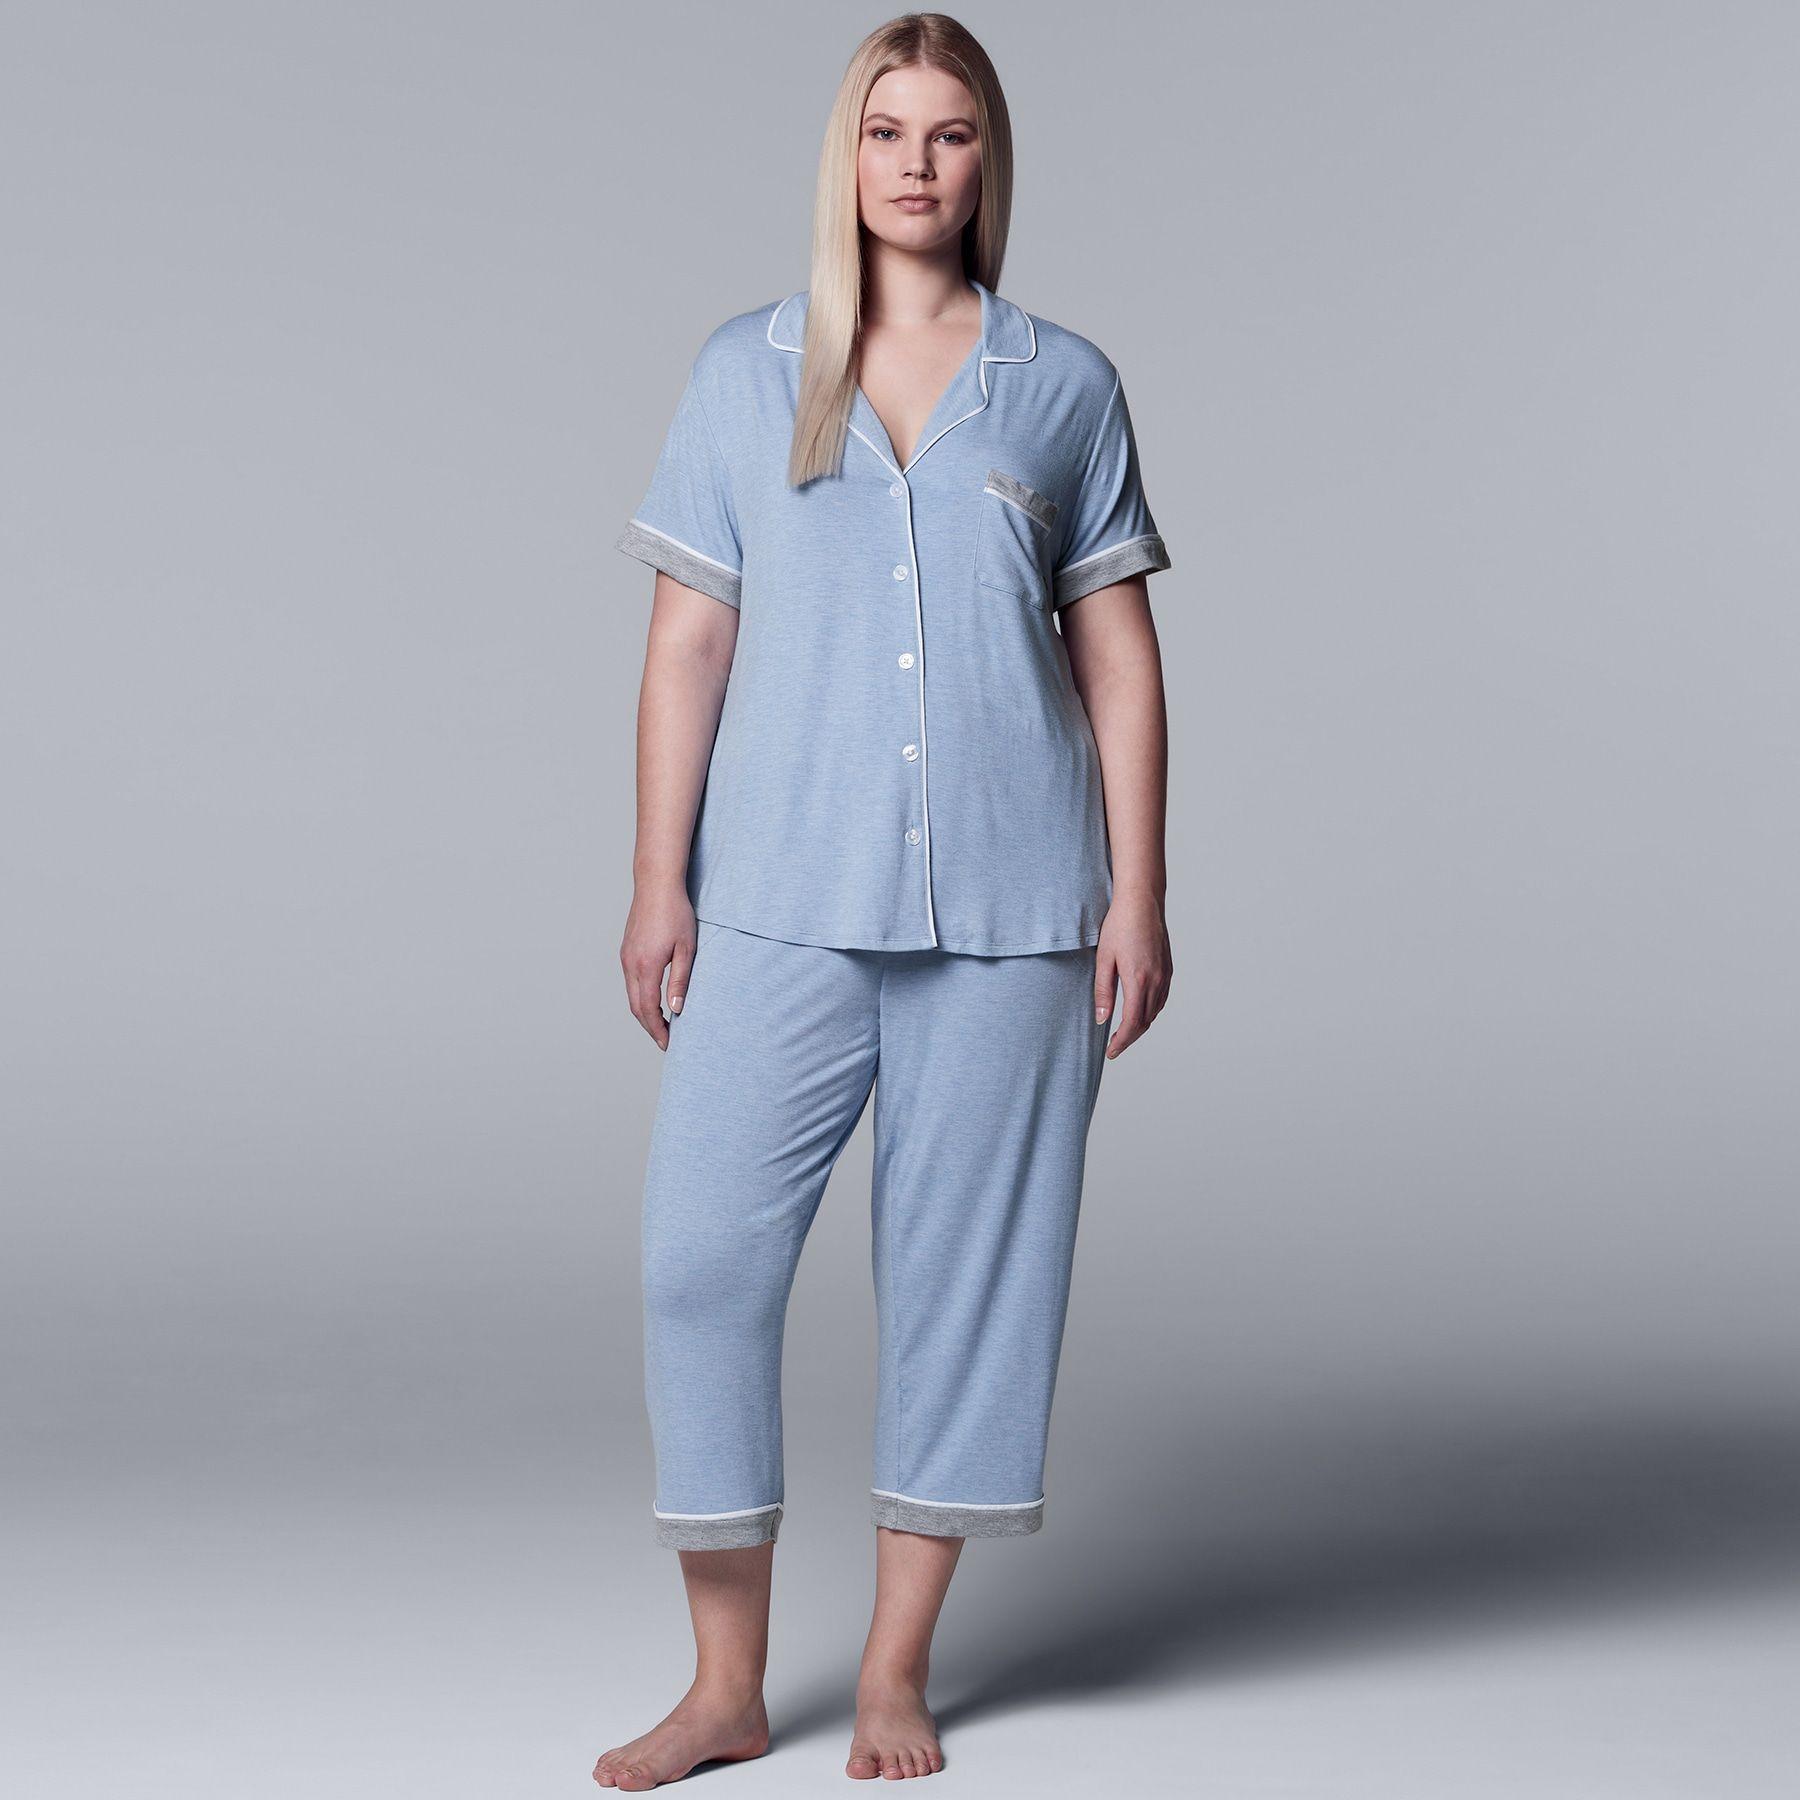 ee7fb180d Plus Size Simply Vera Vera Wang Notch Collar Shirt   Capri Pajama ...